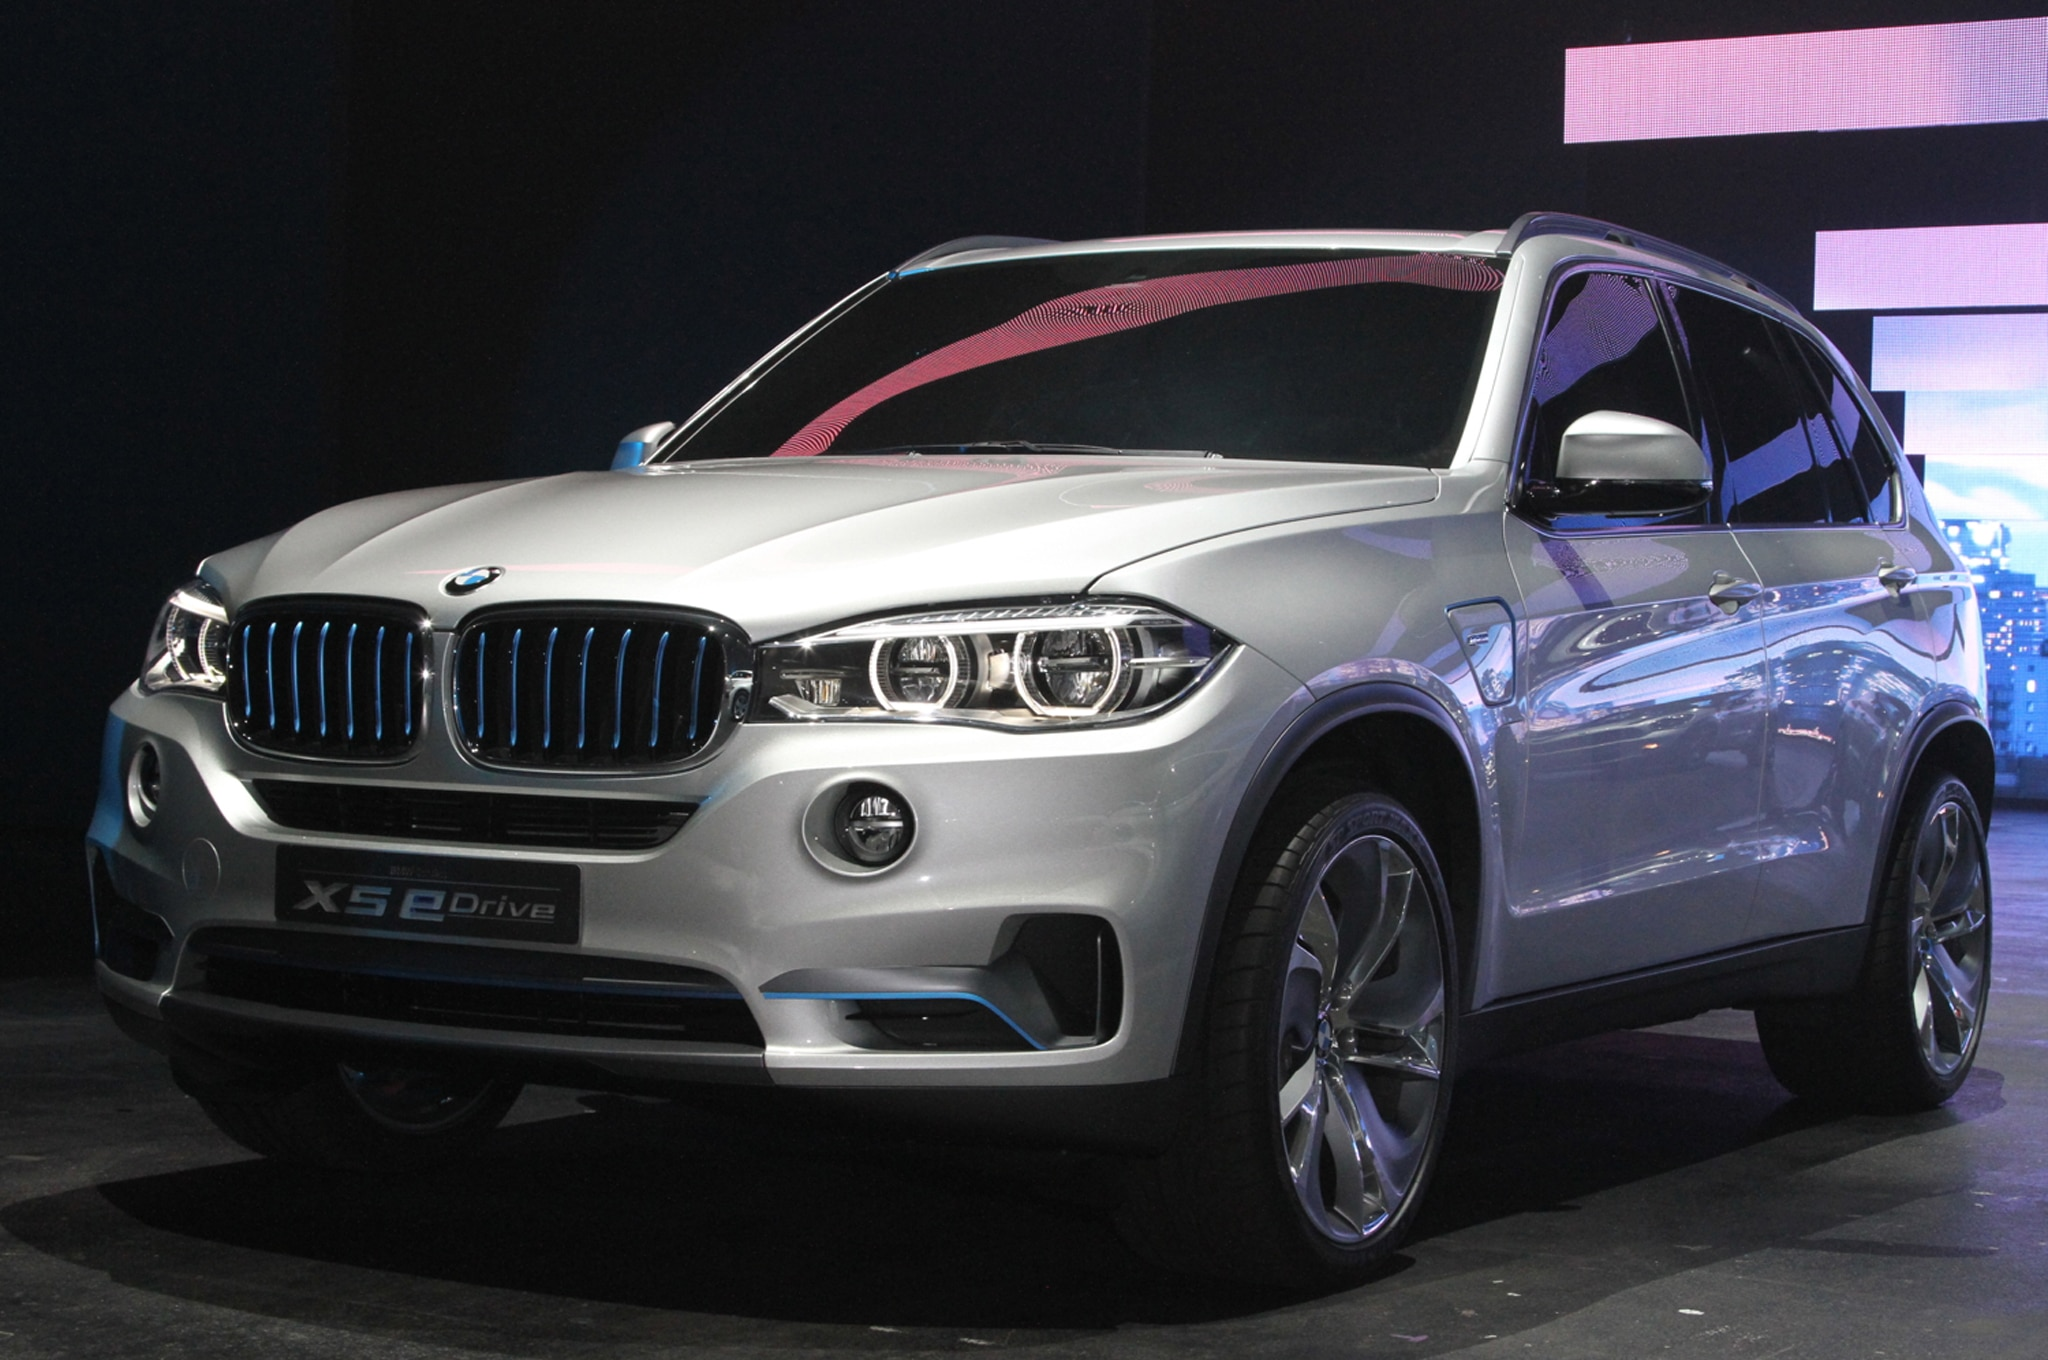 BMW Concept X5 EDrive Front Three Quarters1